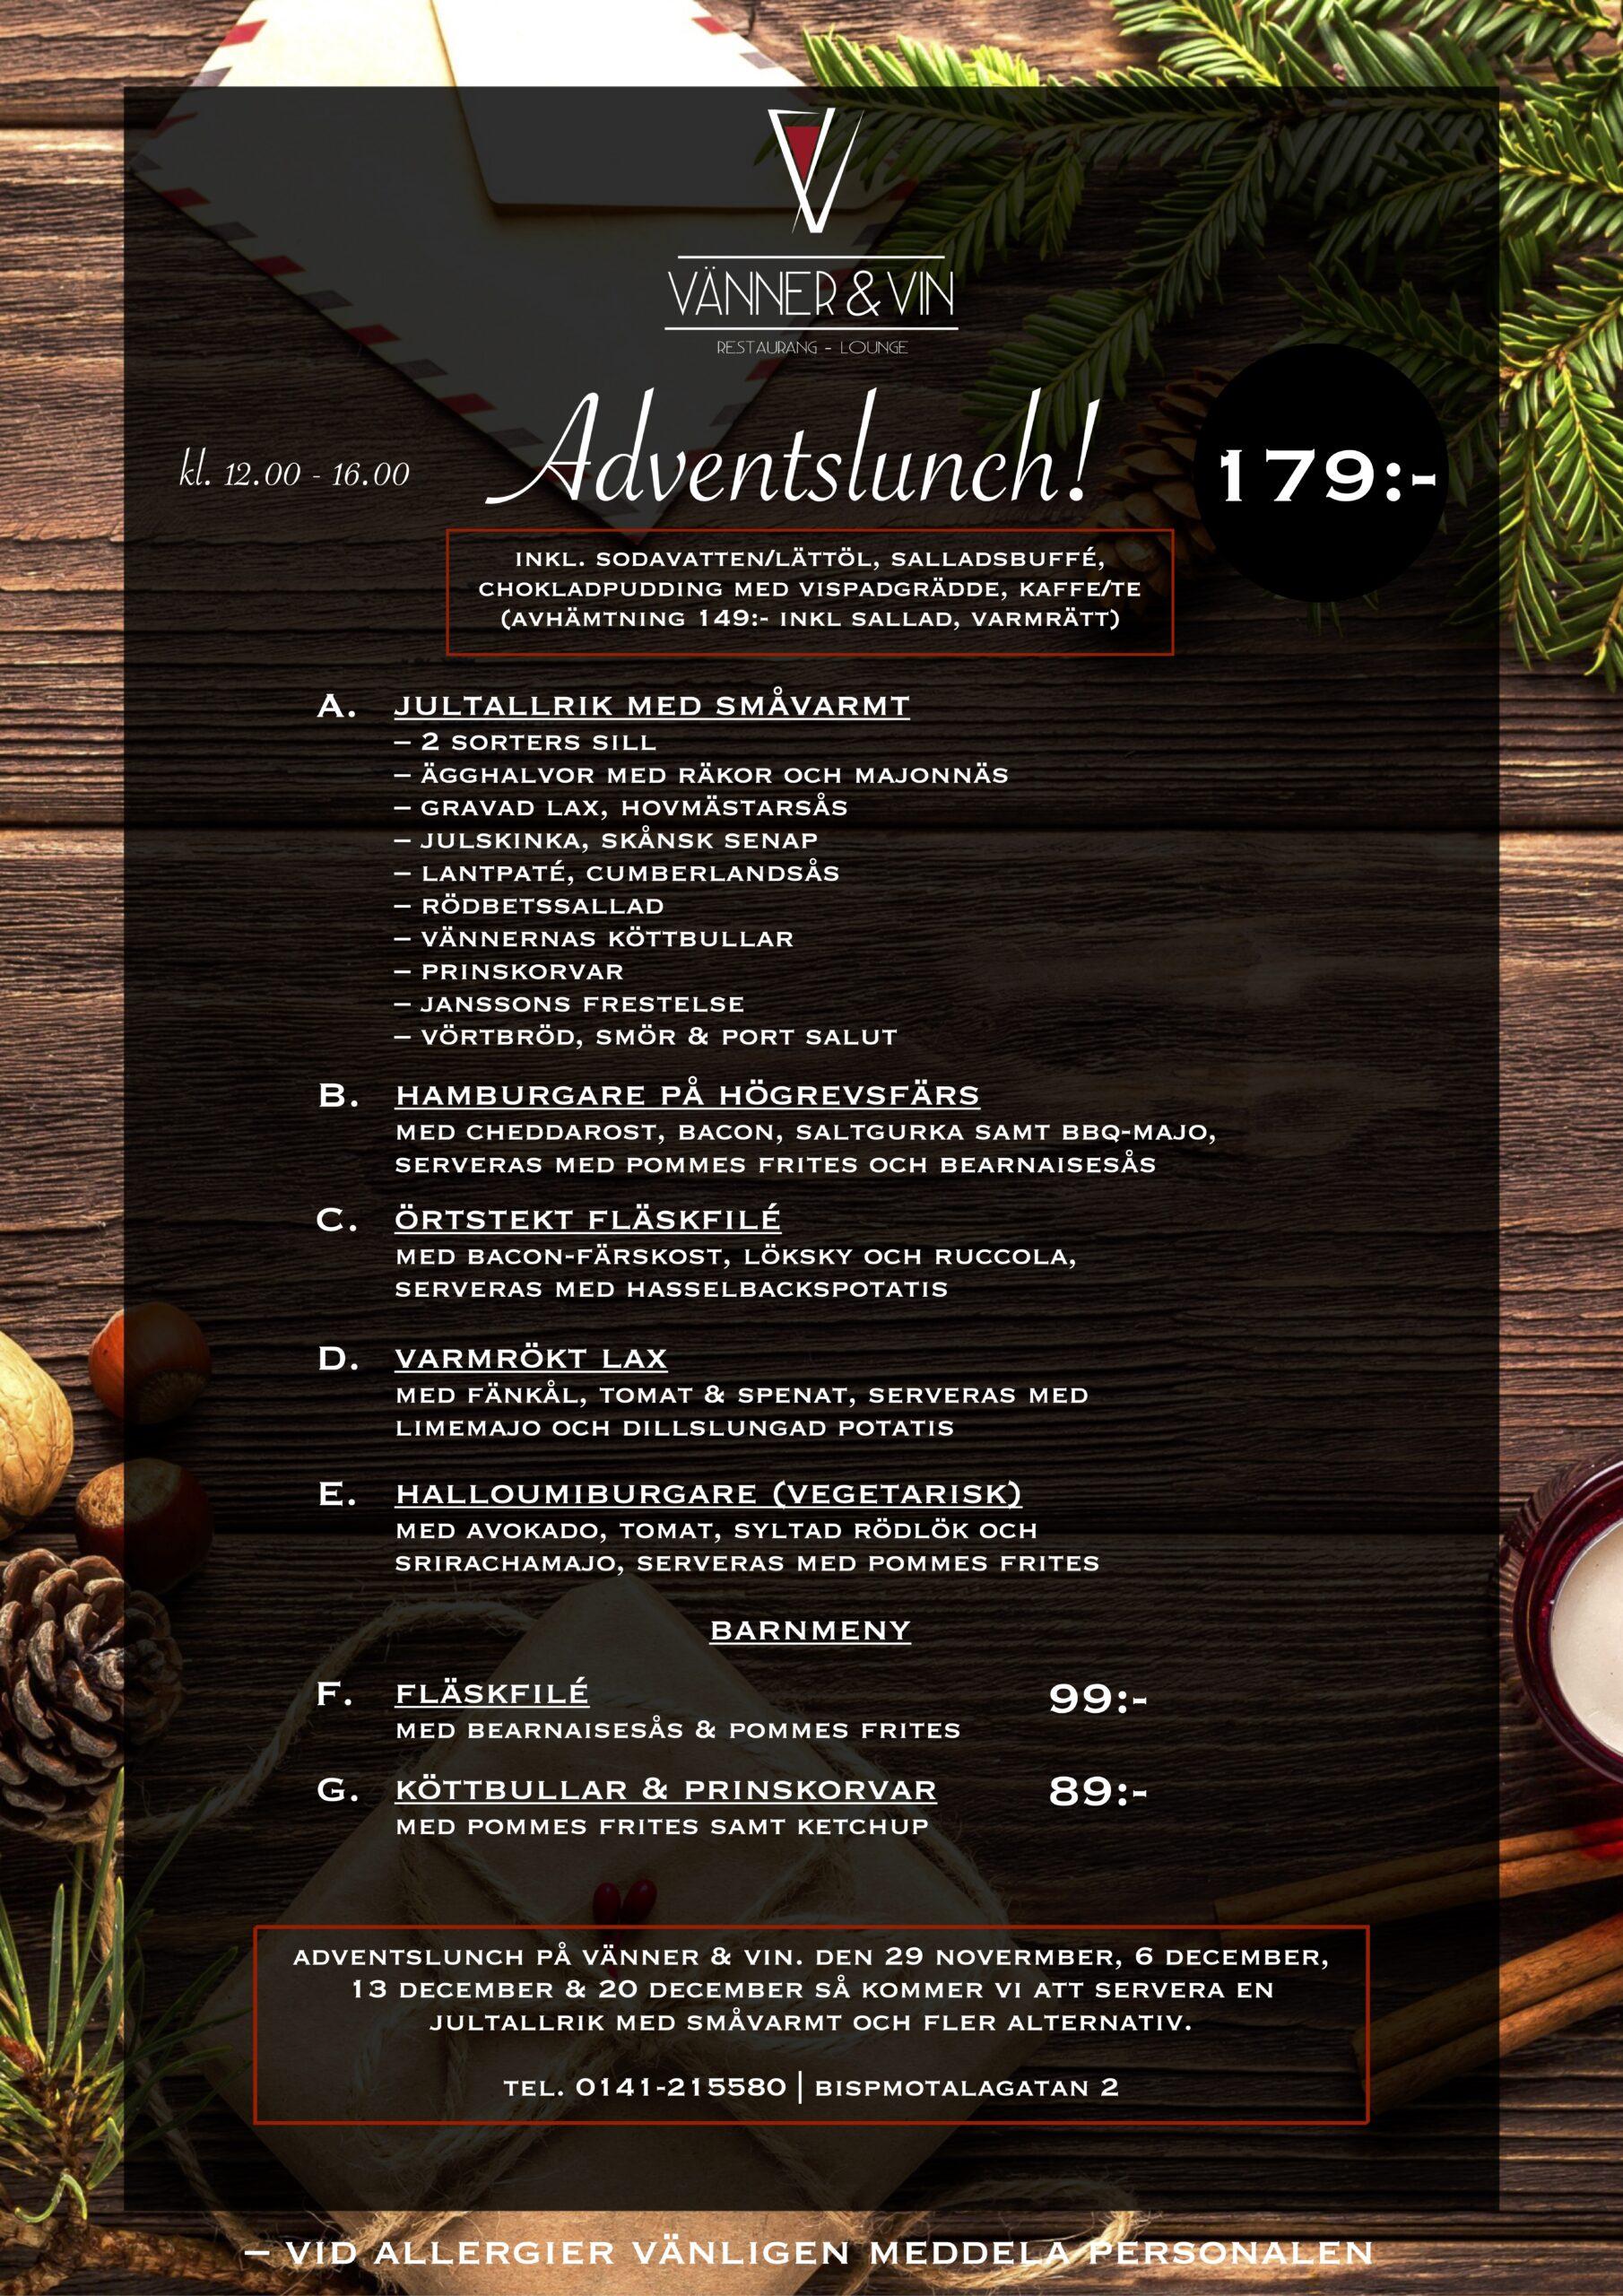 Adventslunch VV 2020